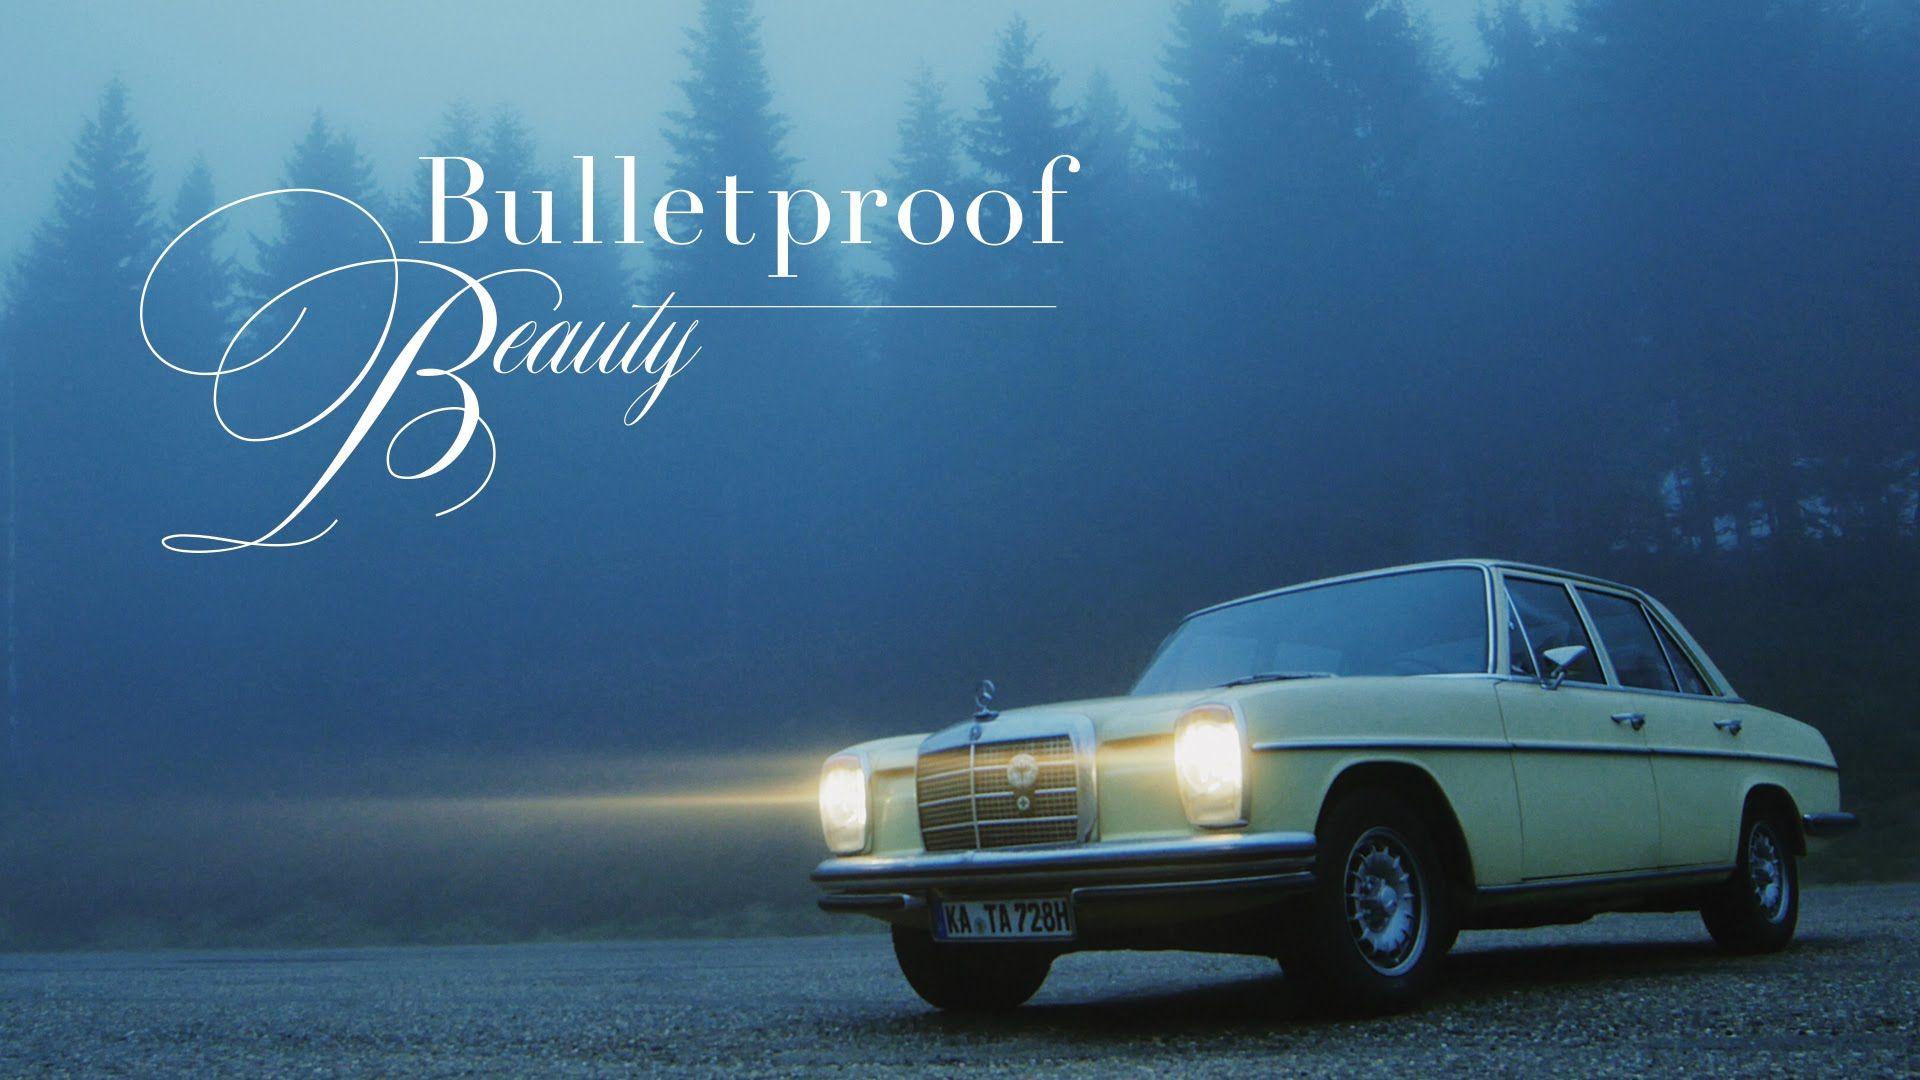 The Mercedes-Benz 280 is a Bulletproof Beauty | Pinterest | Mercedes ...